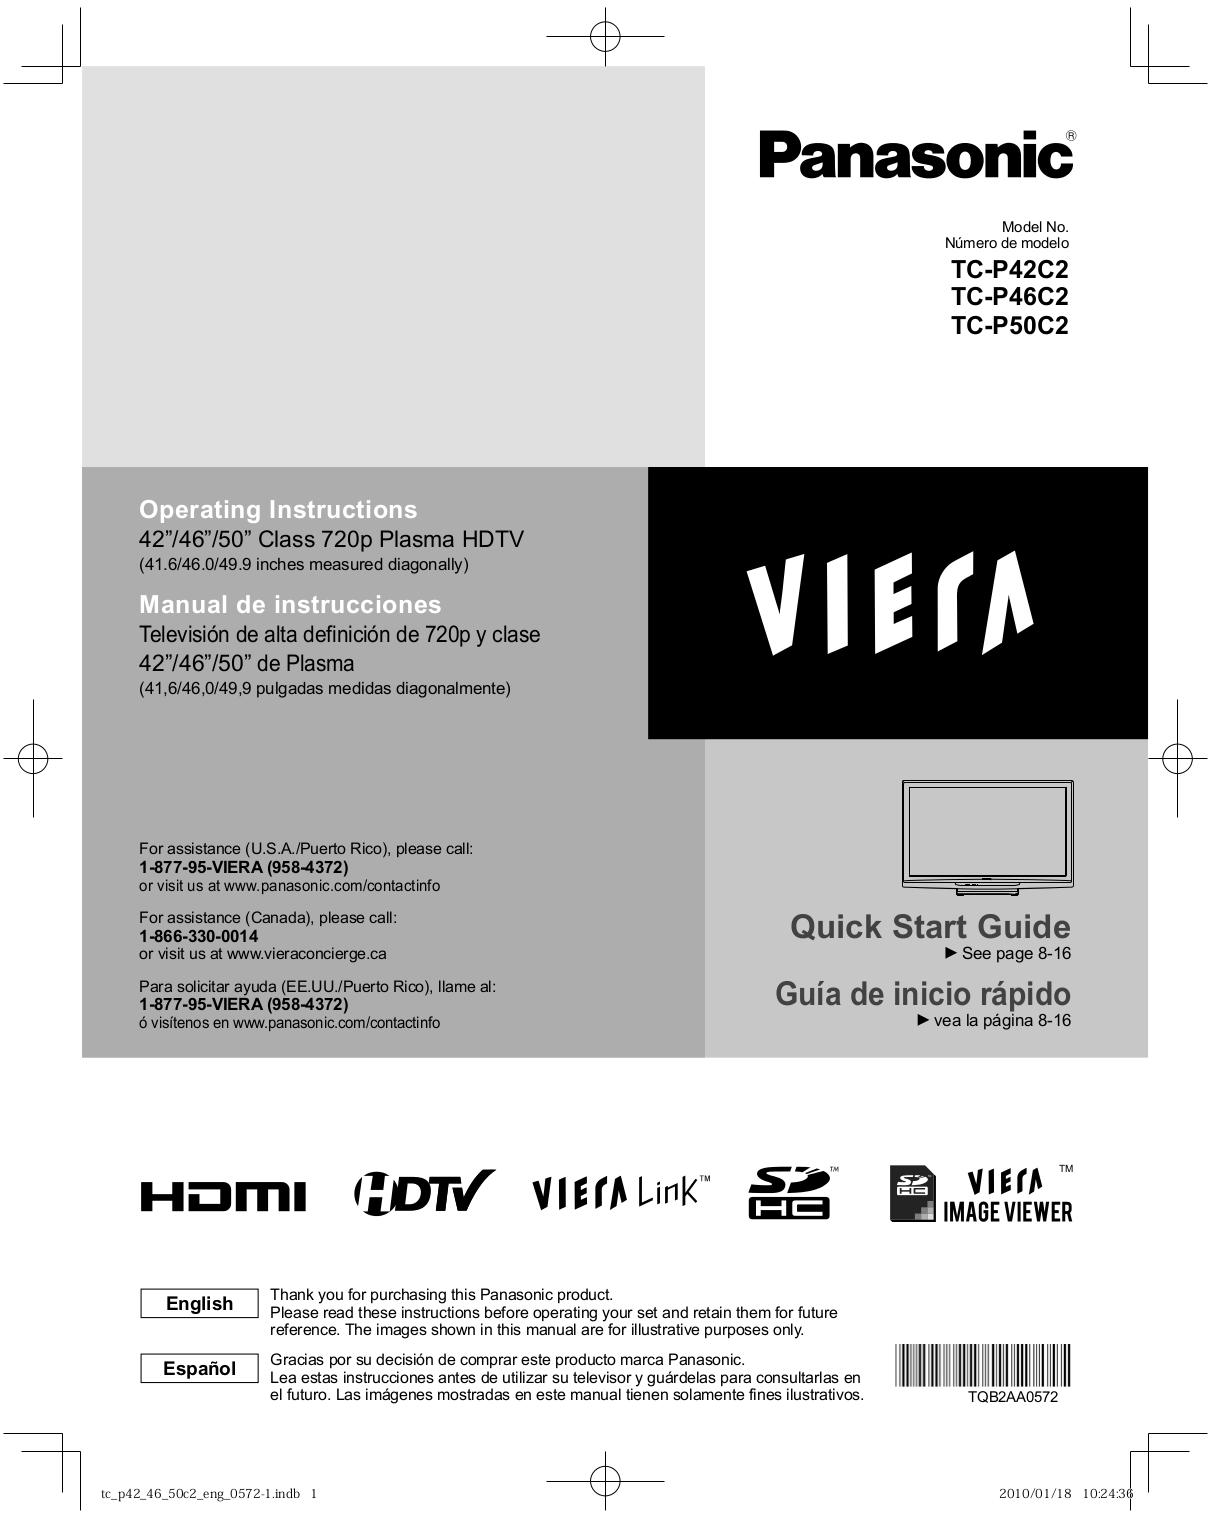 download free pdf for panasonic viera tc p50c2 tv manual rh umlib com panasonic viera 42 manual pdf tv panasonic viera 42 manual